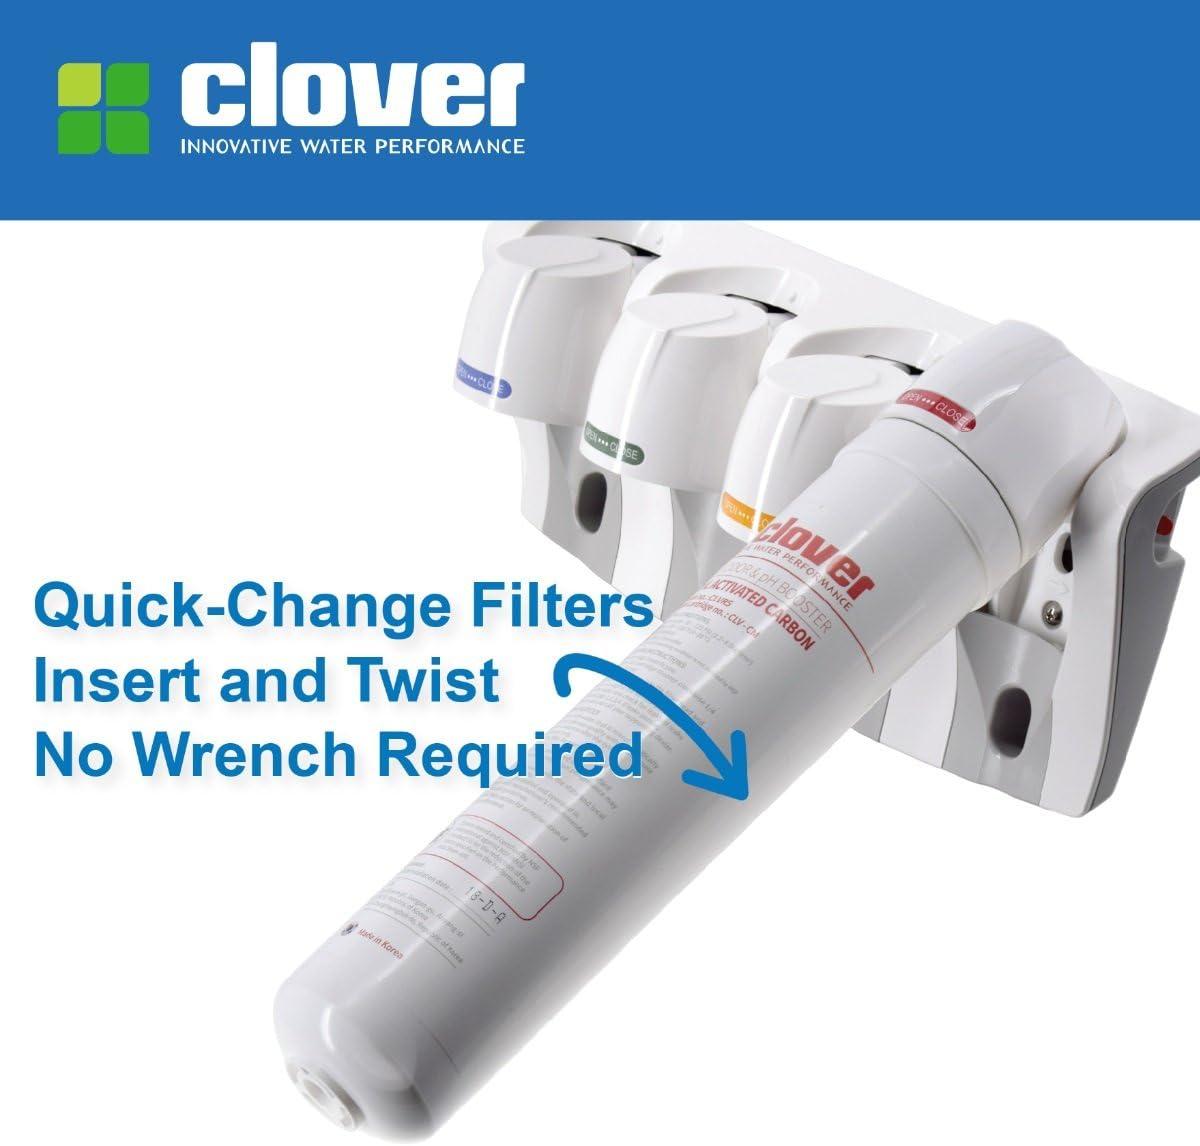 Pleated Micro Glass Media Millennium Filters PUROLATOR-FACET MN-8310EAL032N1 Direct Interchange for PUROLATOR-FACET-8310EAL032N1